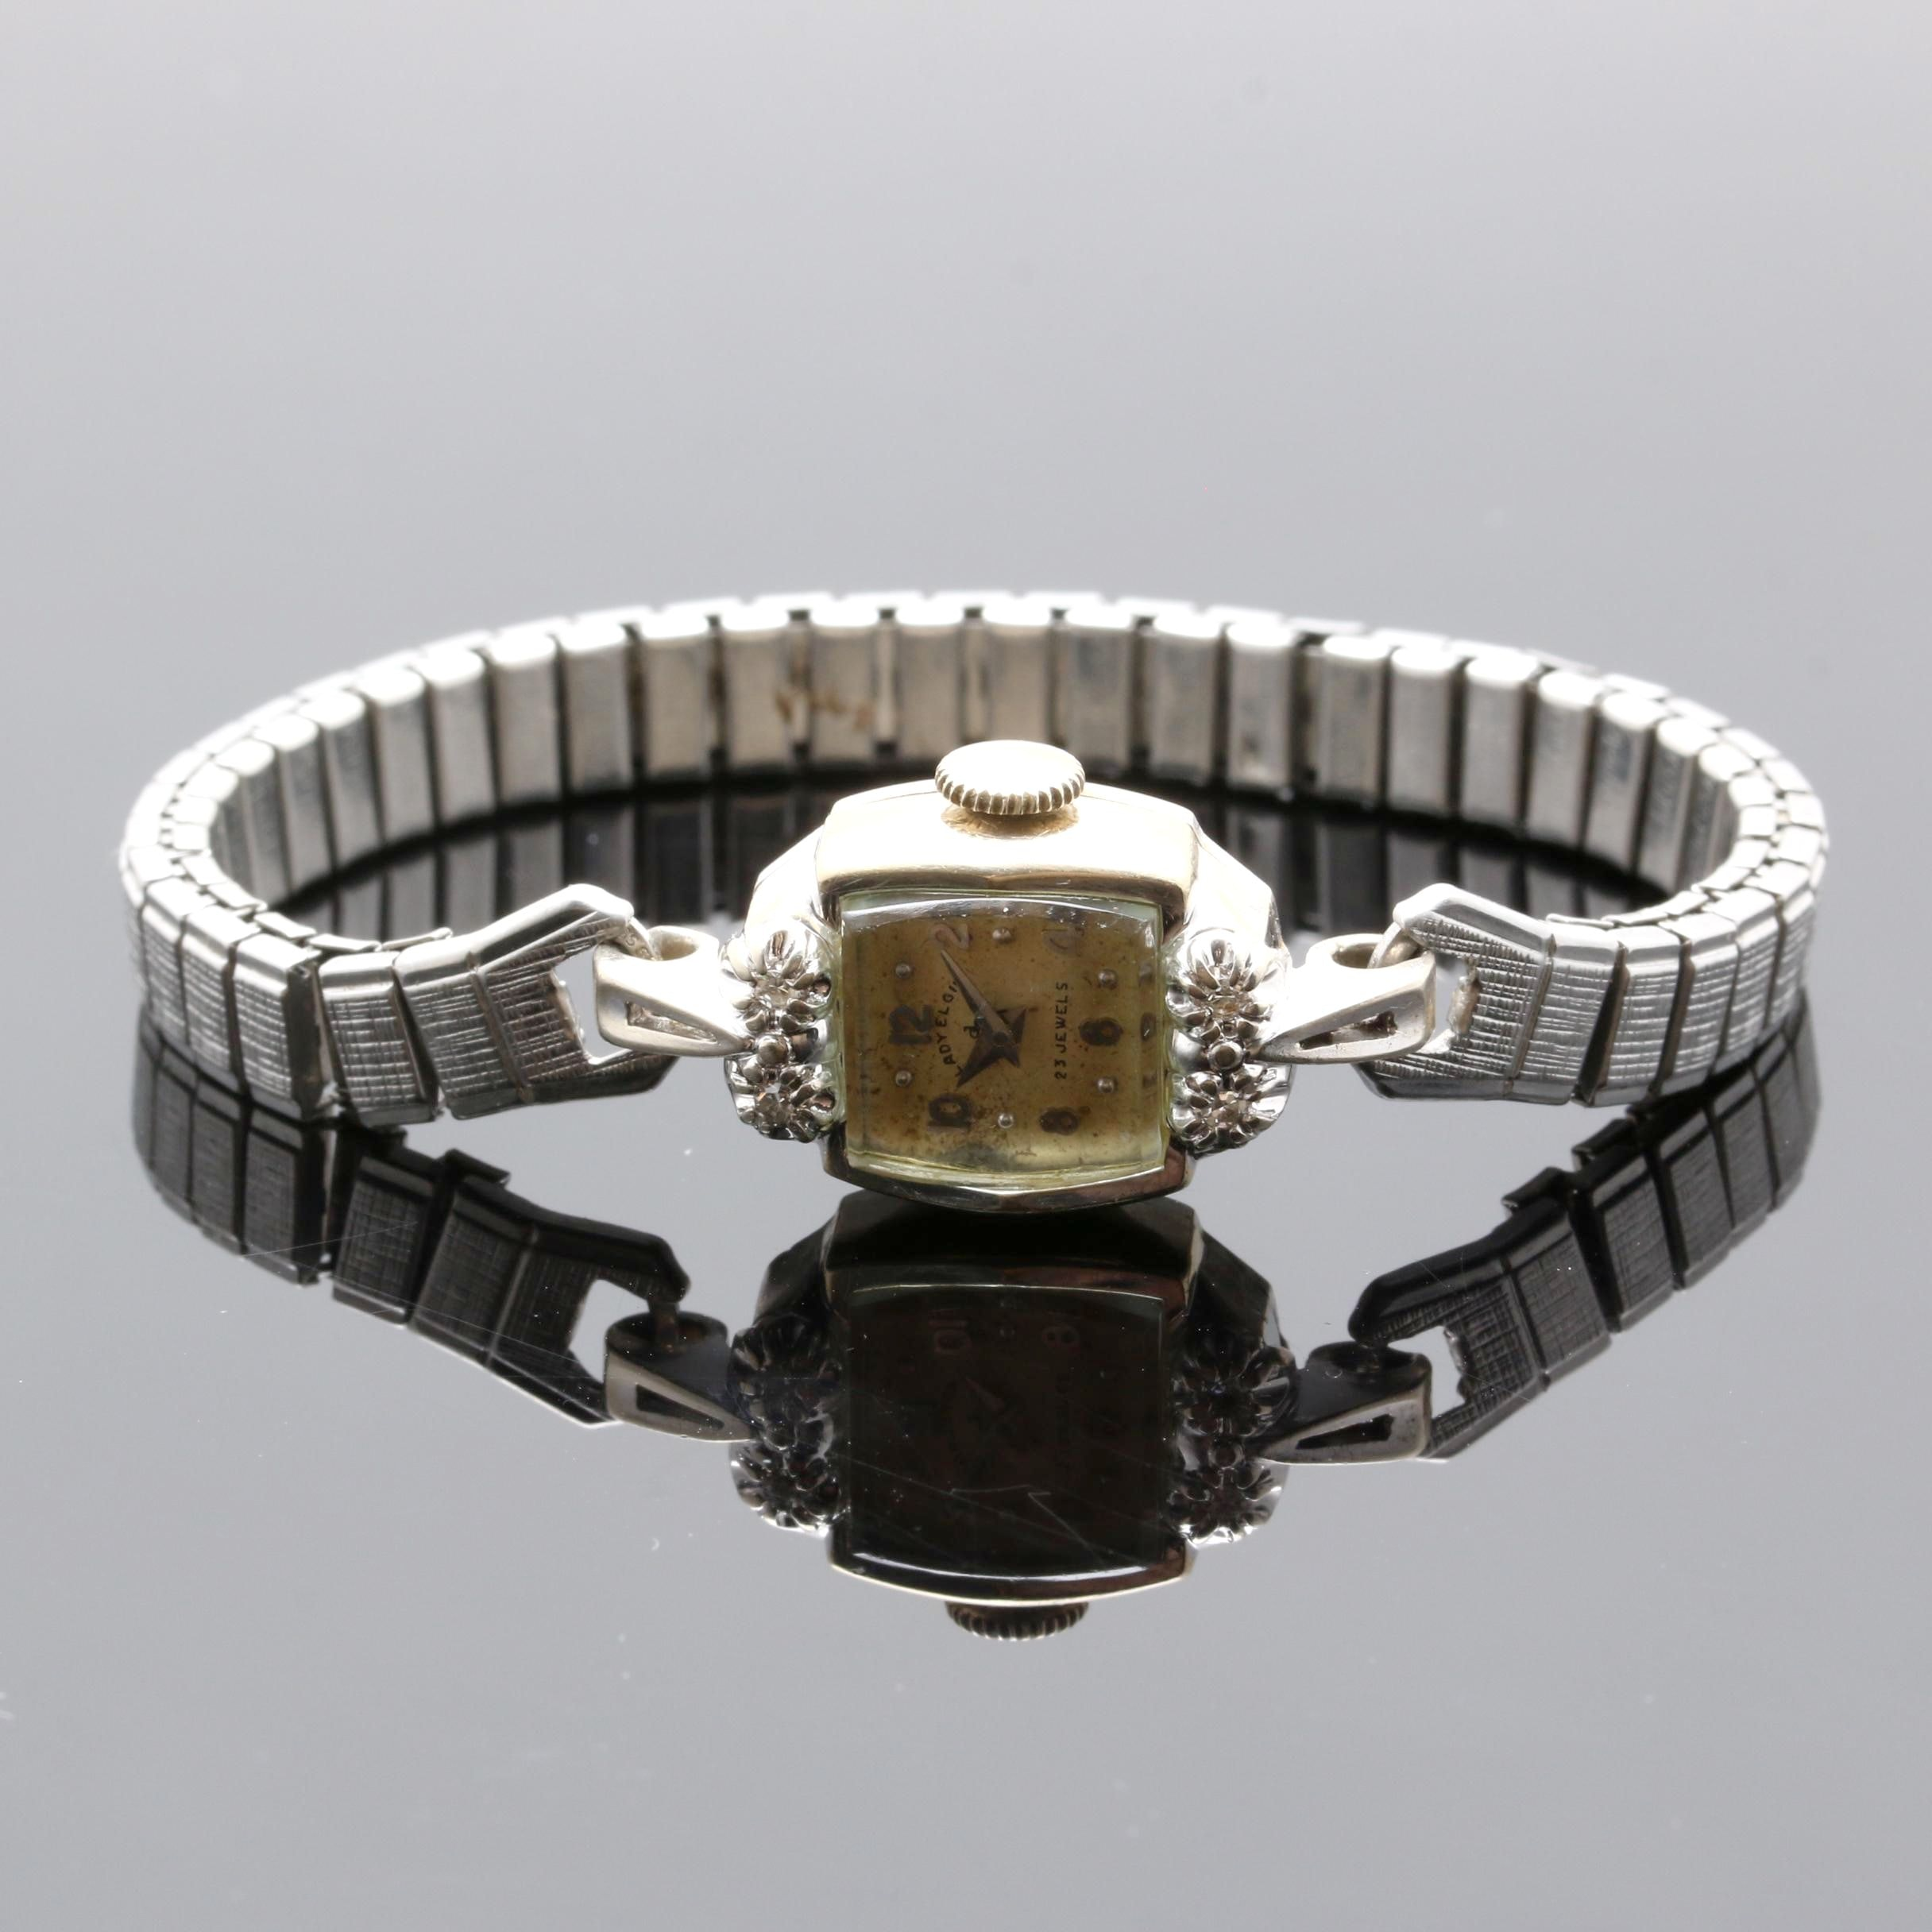 Lady Elgin 14K White Gold and Diamond Wristwatch